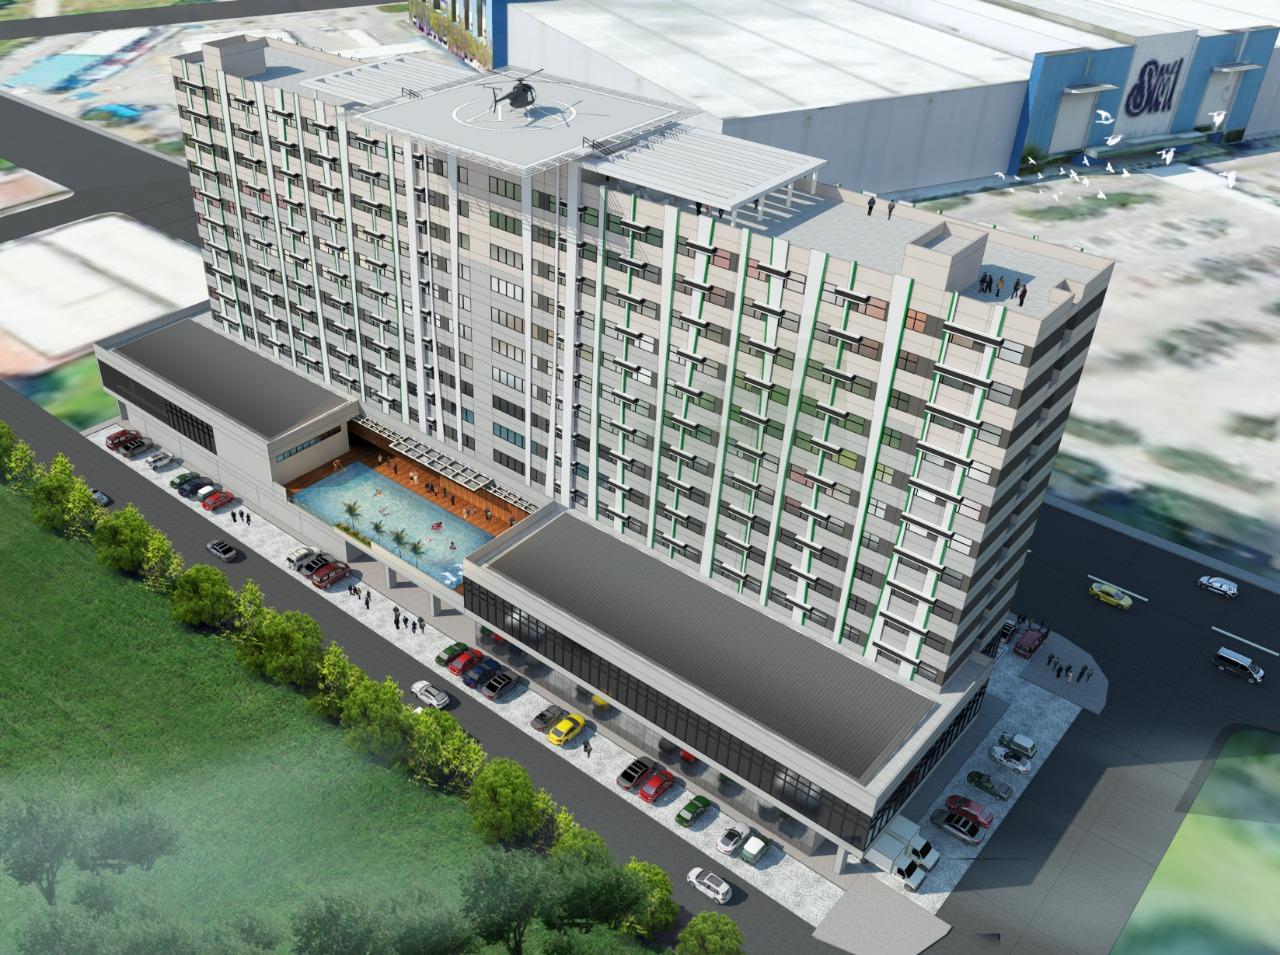 Hotel 101 - Davao Perspective